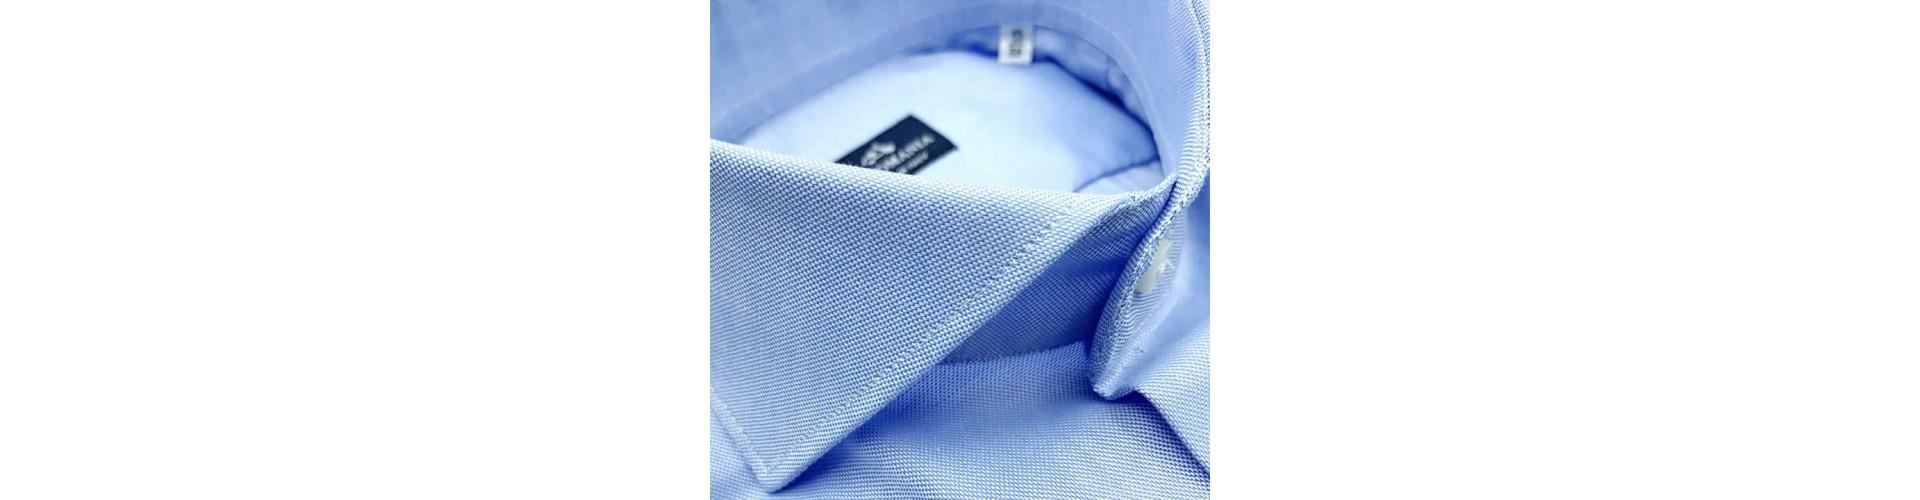 Camisas Cuello Italiano